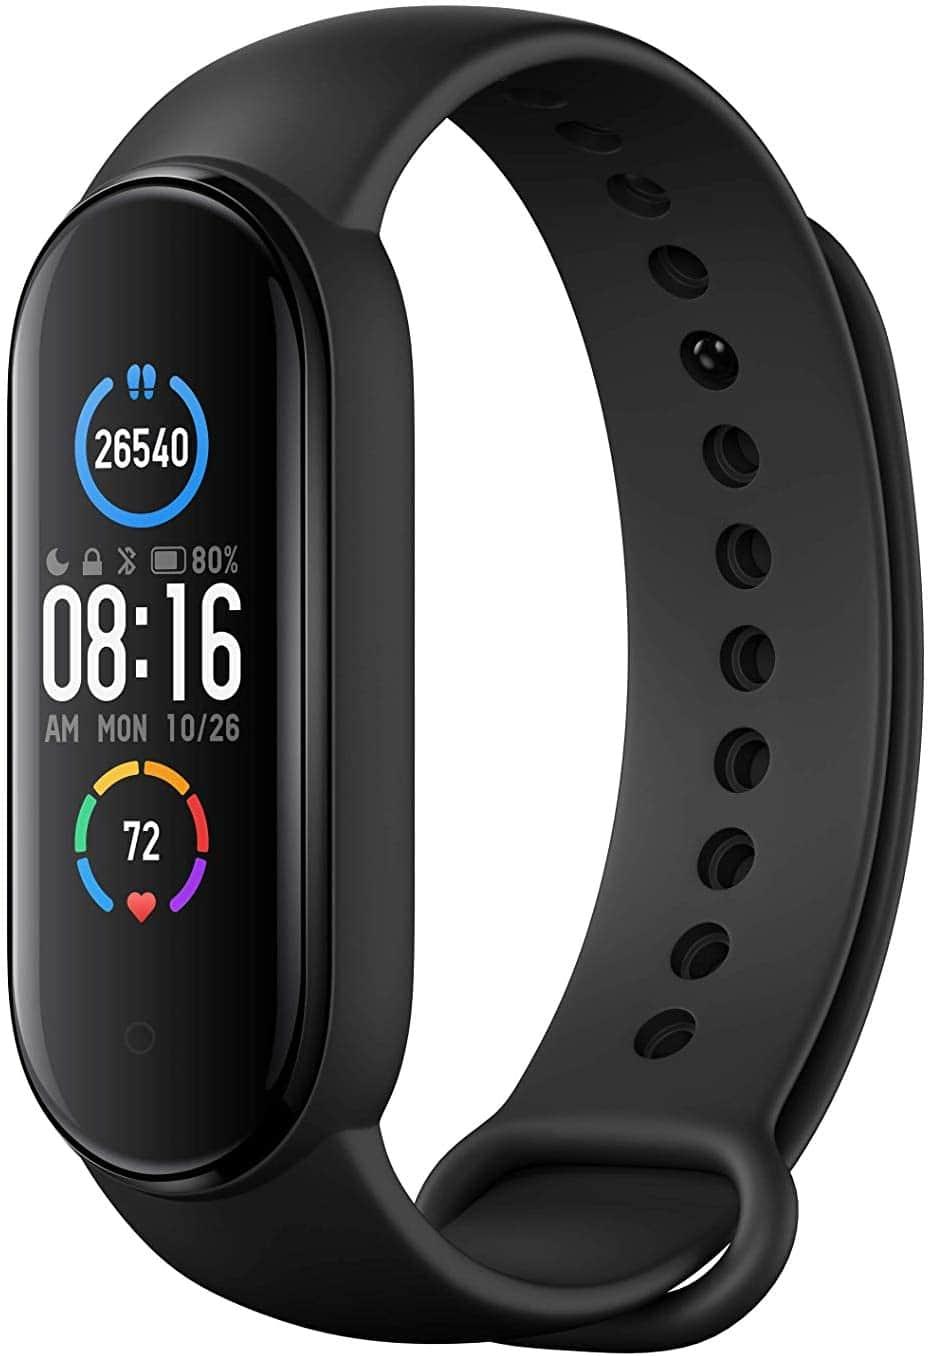 Xiaomi Band 5 Smart Fitness Bracelet Heart Rate Monitor, Sports Waterproof Wristband, Bluetooth 5.0 Color AMOLED Screen, Black, Mi band 5, black